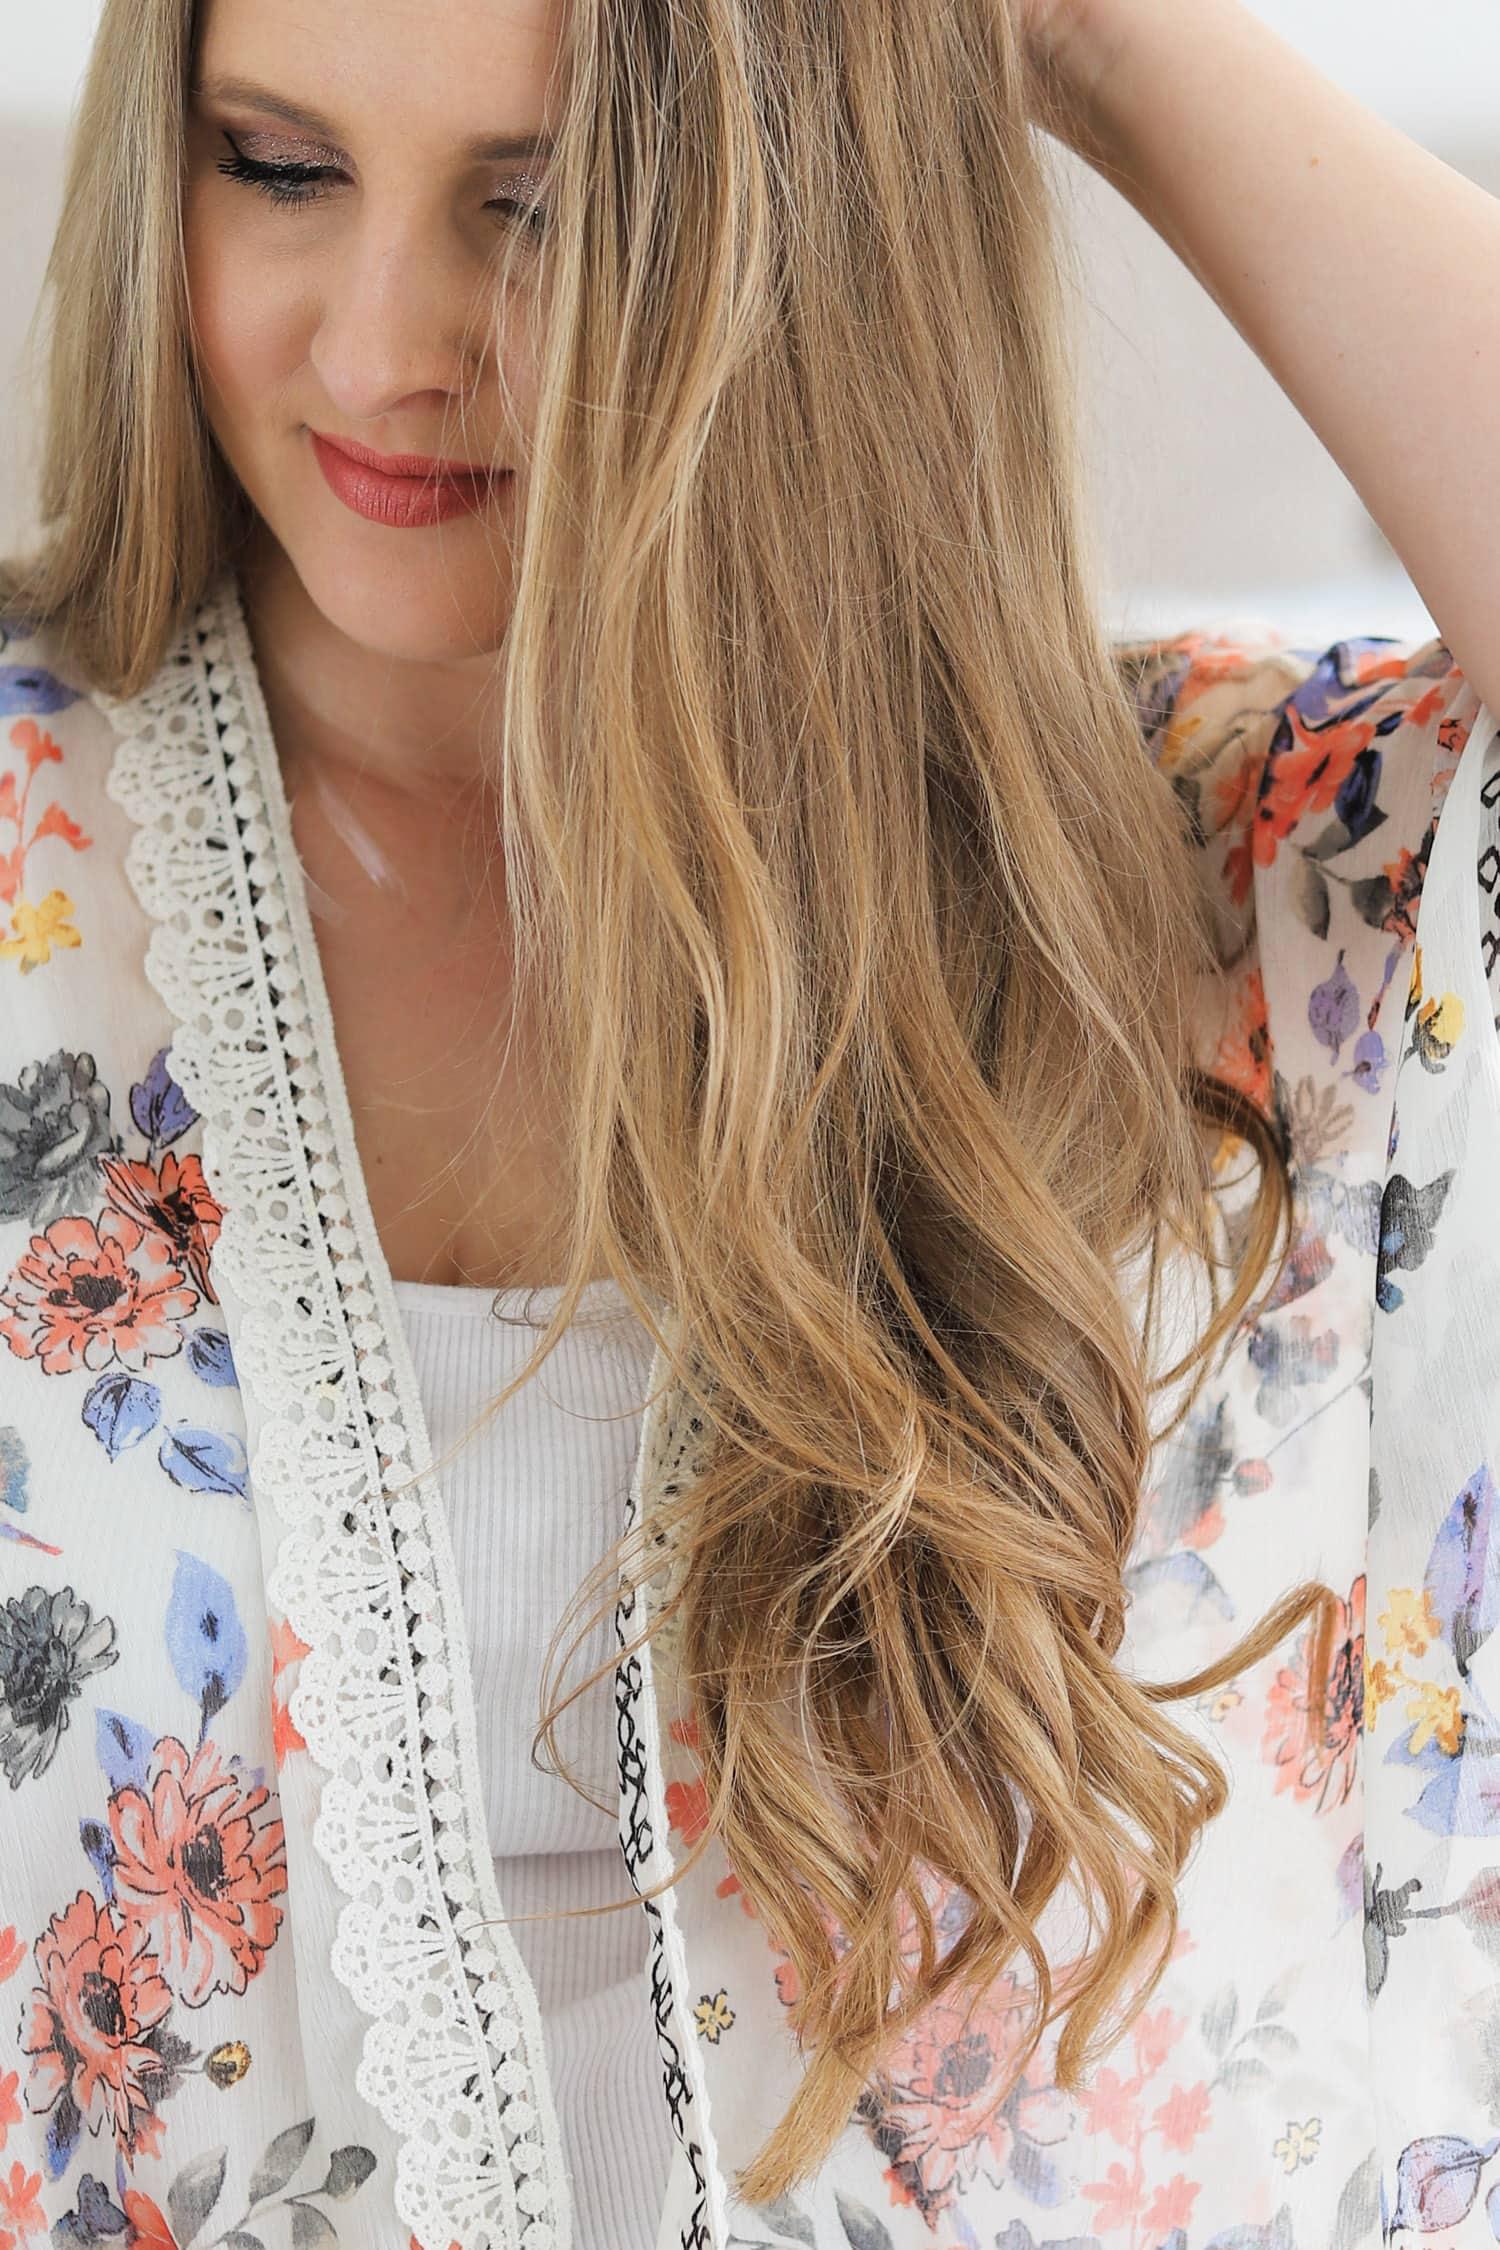 Smiling woman, beautiful easy boho hair tutorial, cute hair tutorial, dirty blonde hair, Ashley Brook Nicholas